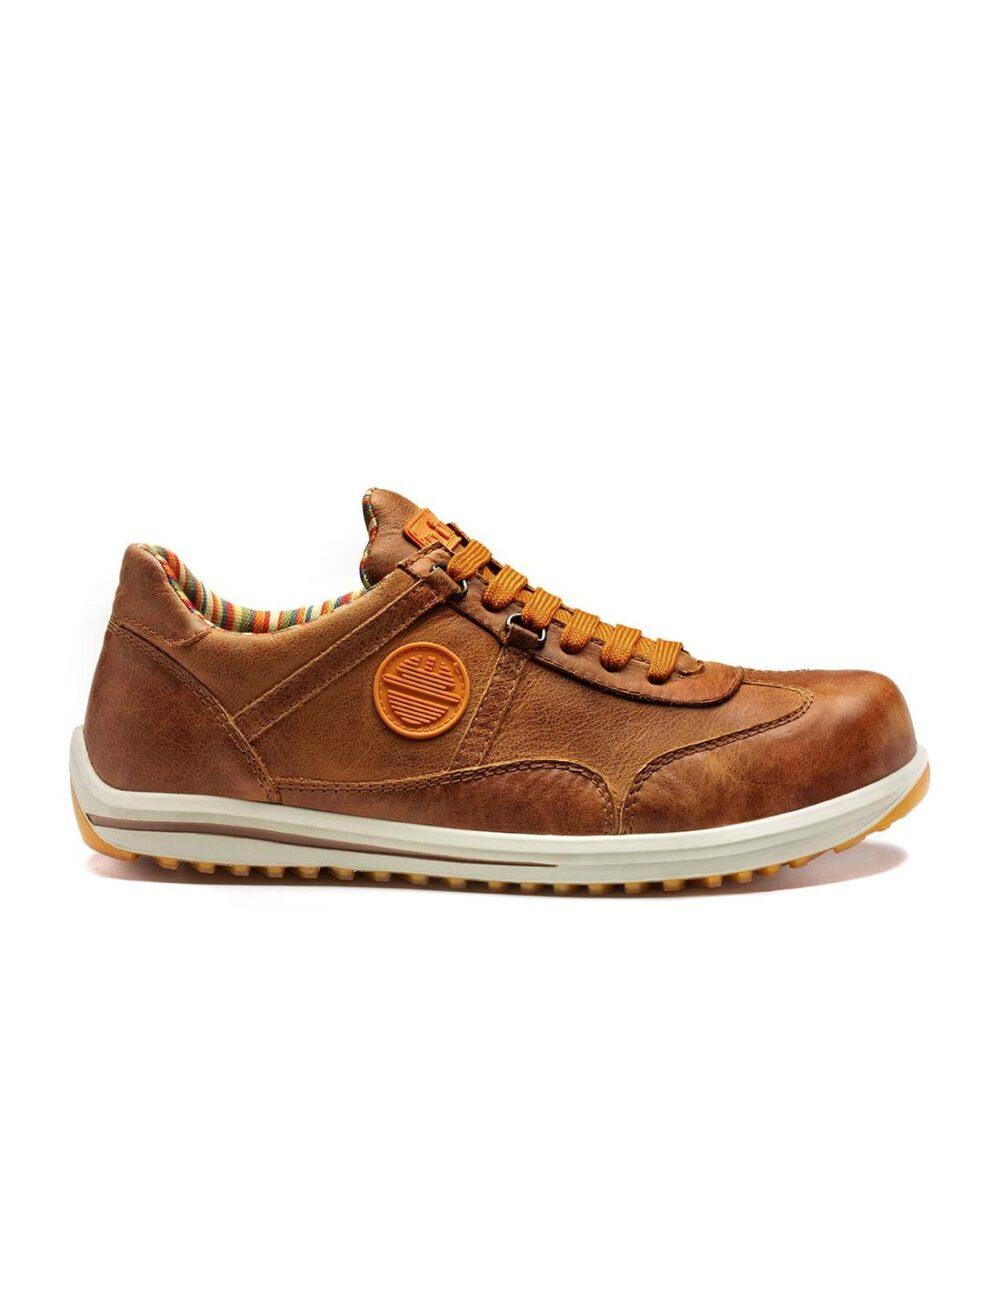 Raving Safety shoe brown side profile